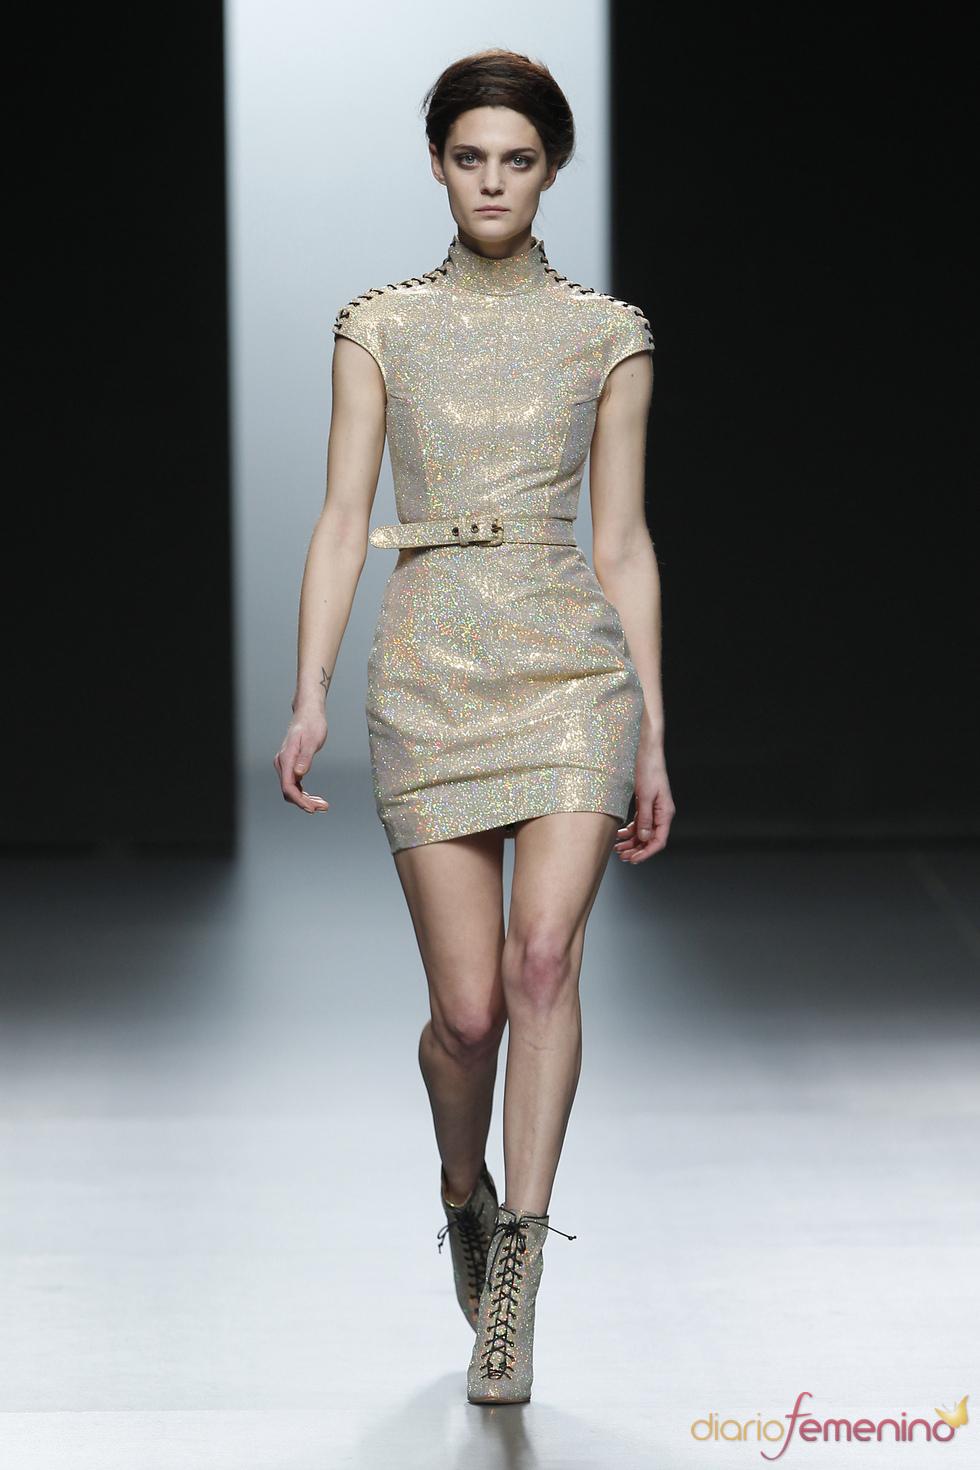 Vestido futurista. Nicolás Vaudelet. Cibeles Madrid Fashion Week 2011